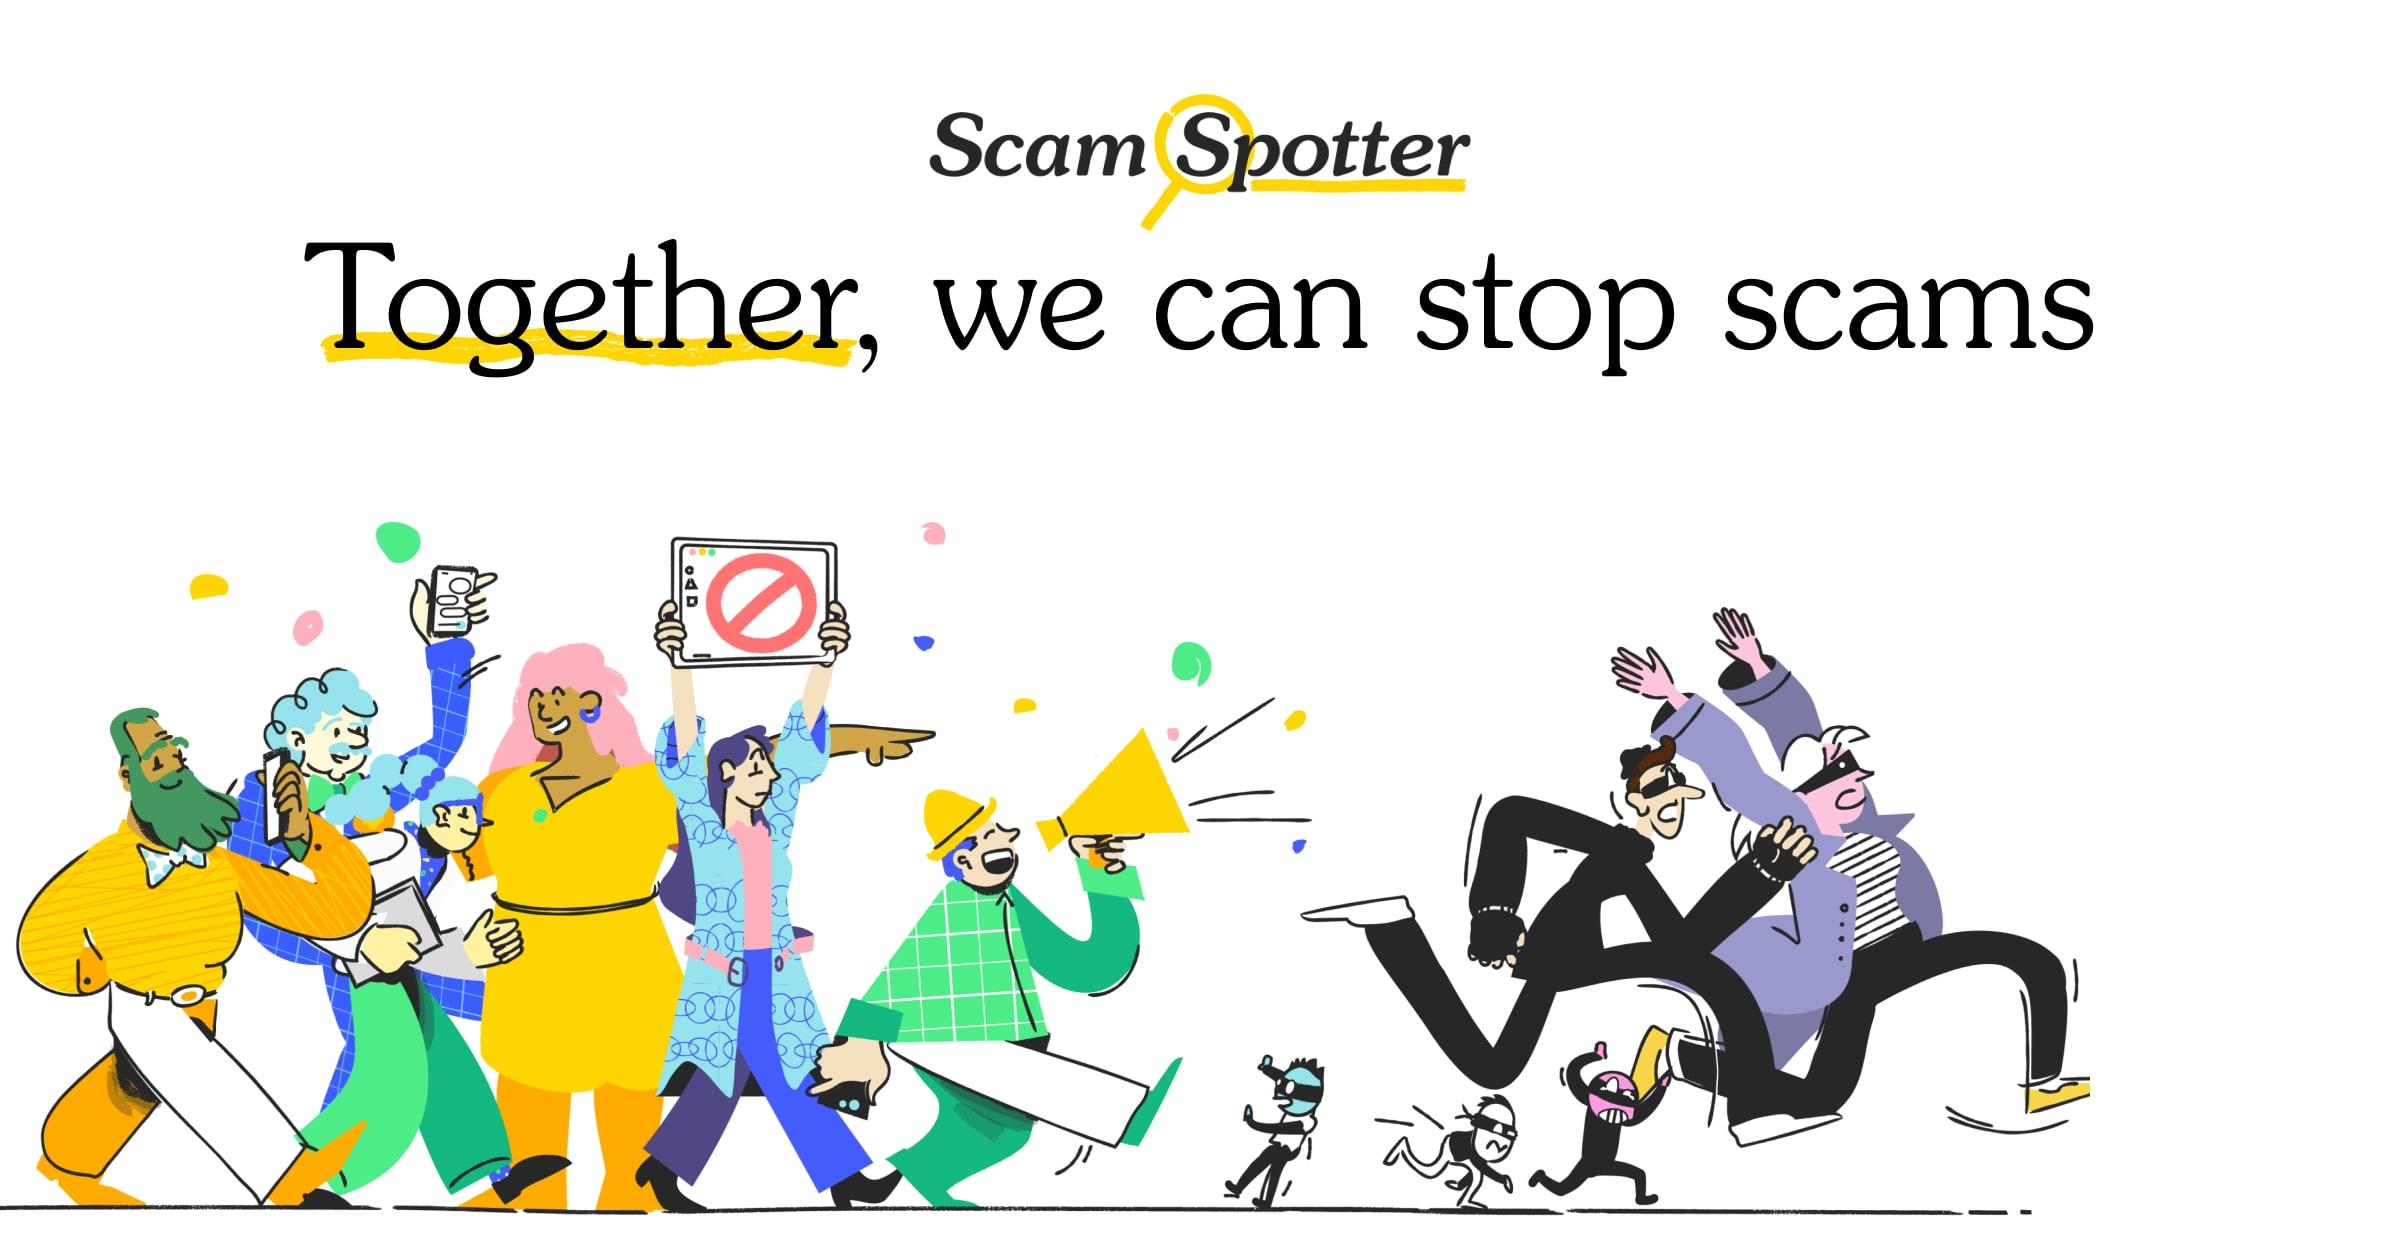 Scam Spotter